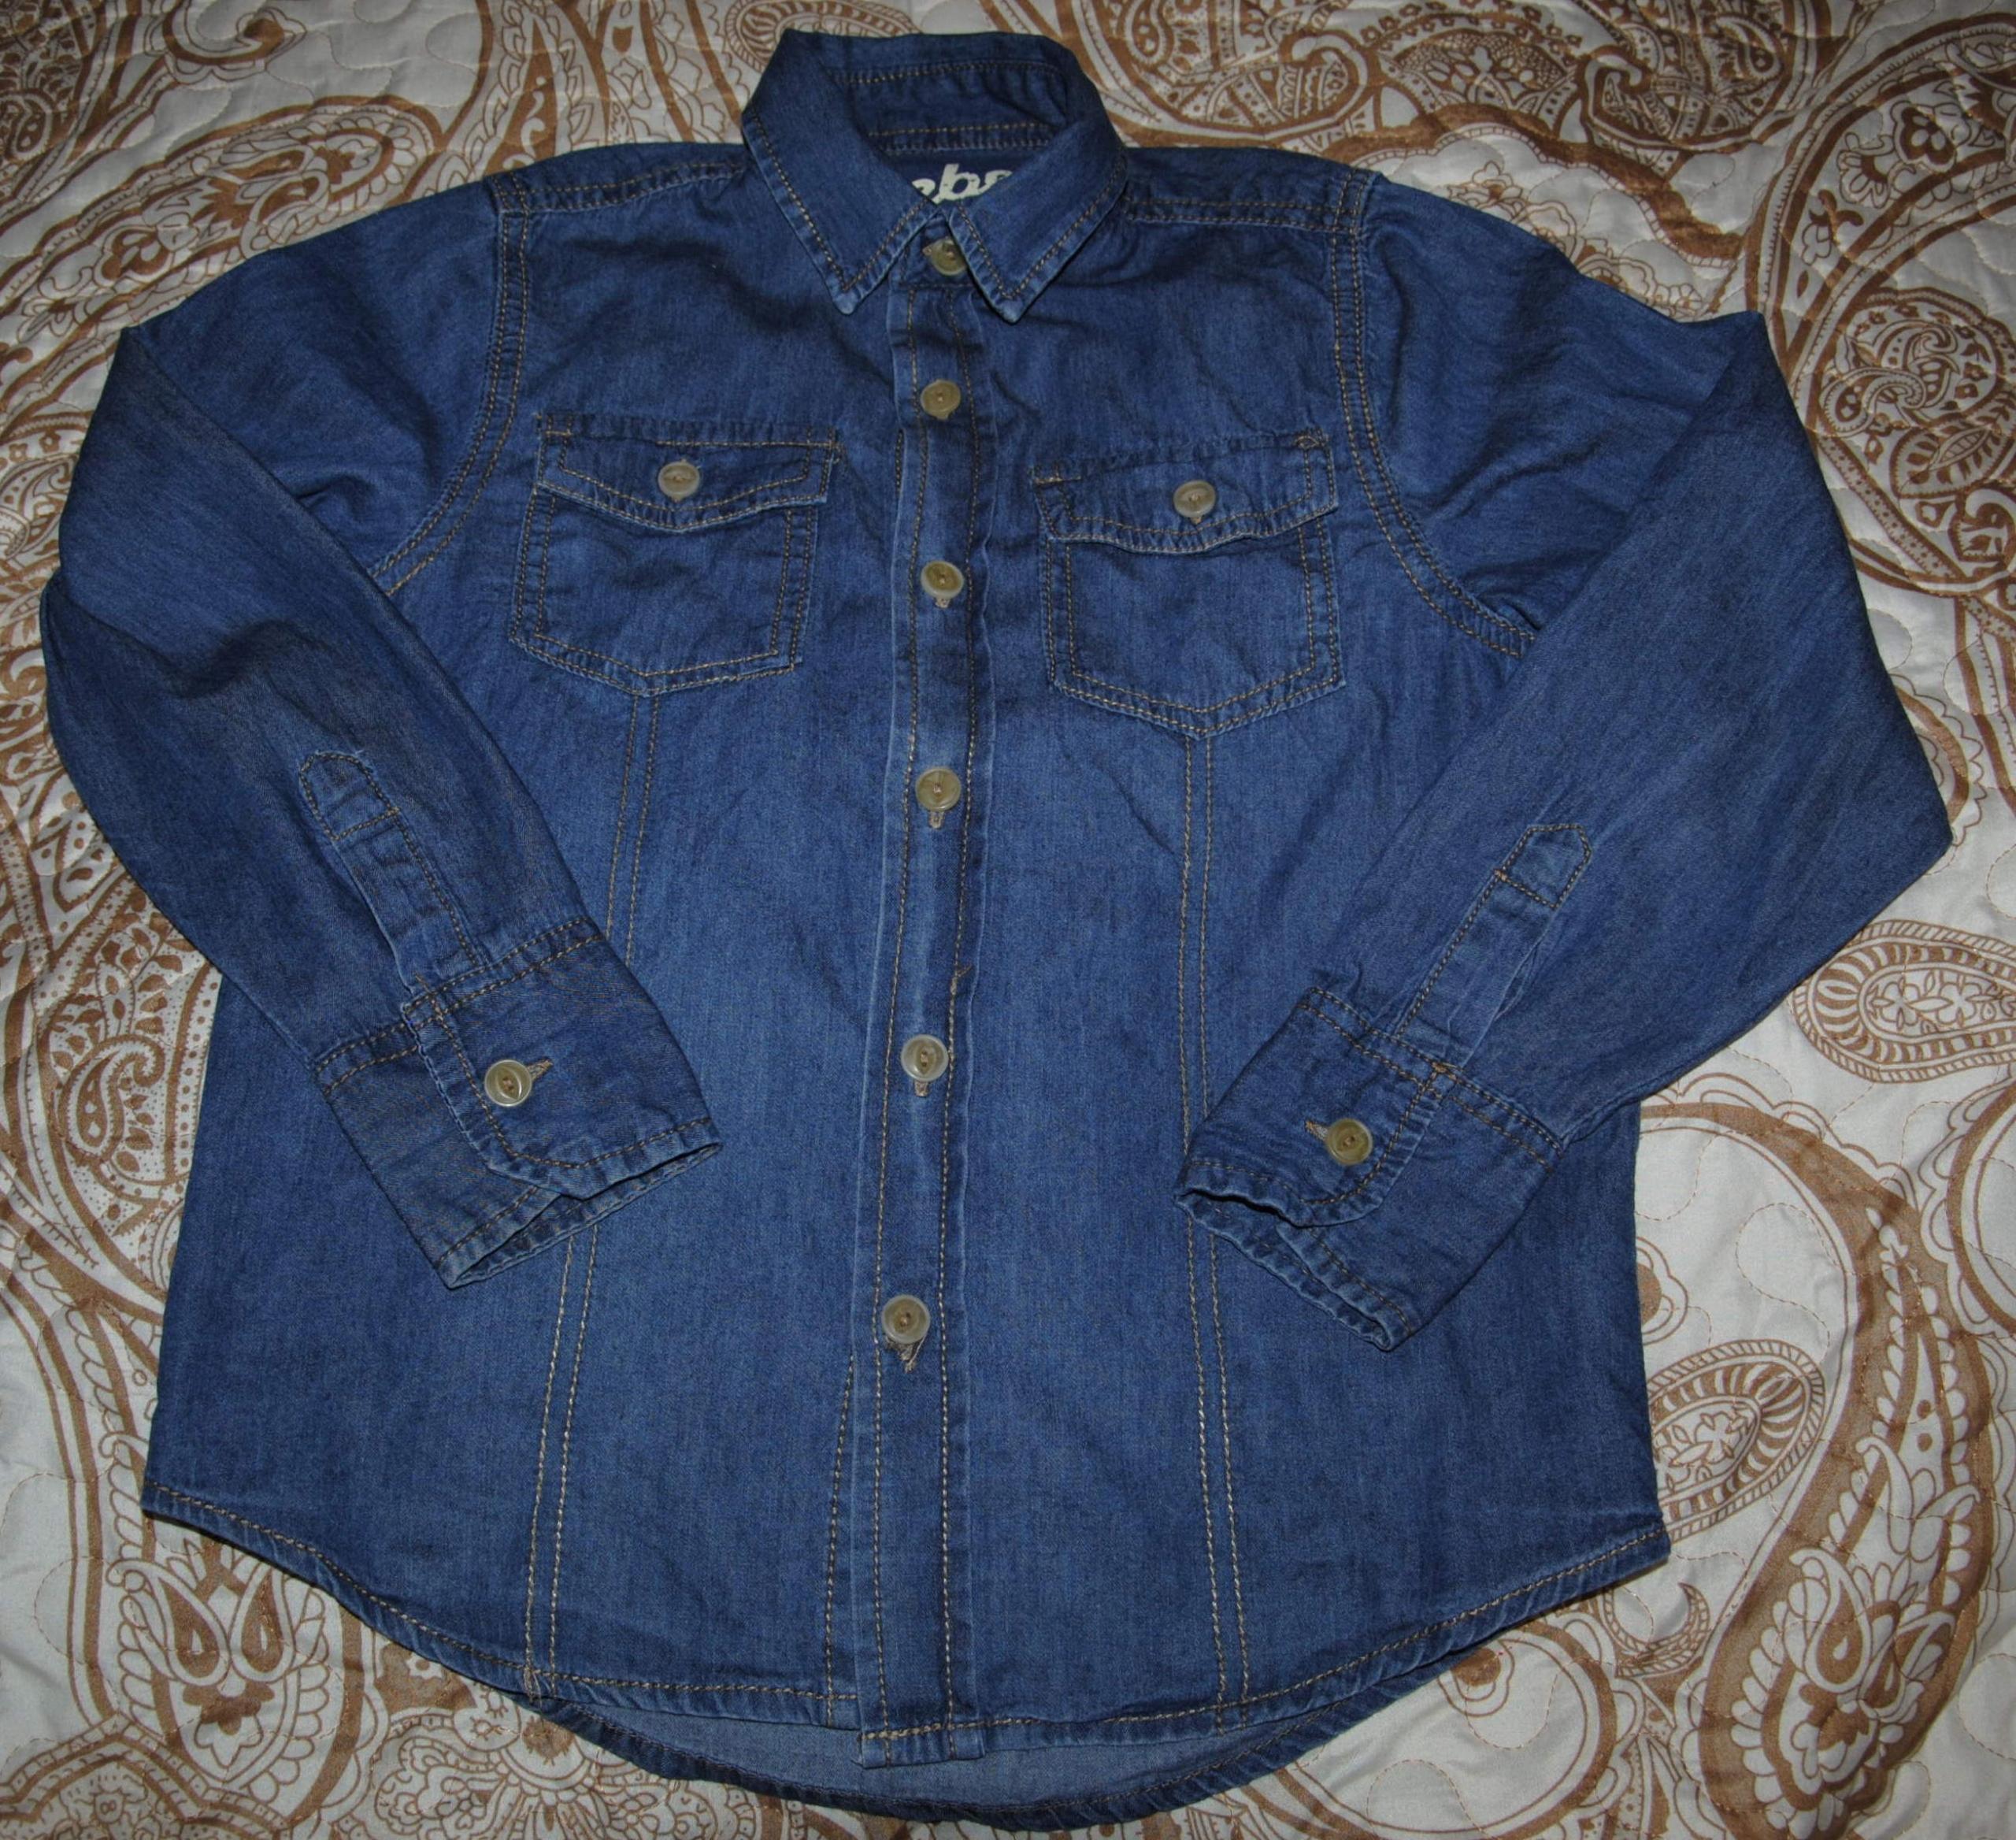 REBEL koszula miękki jeans 122 - 128